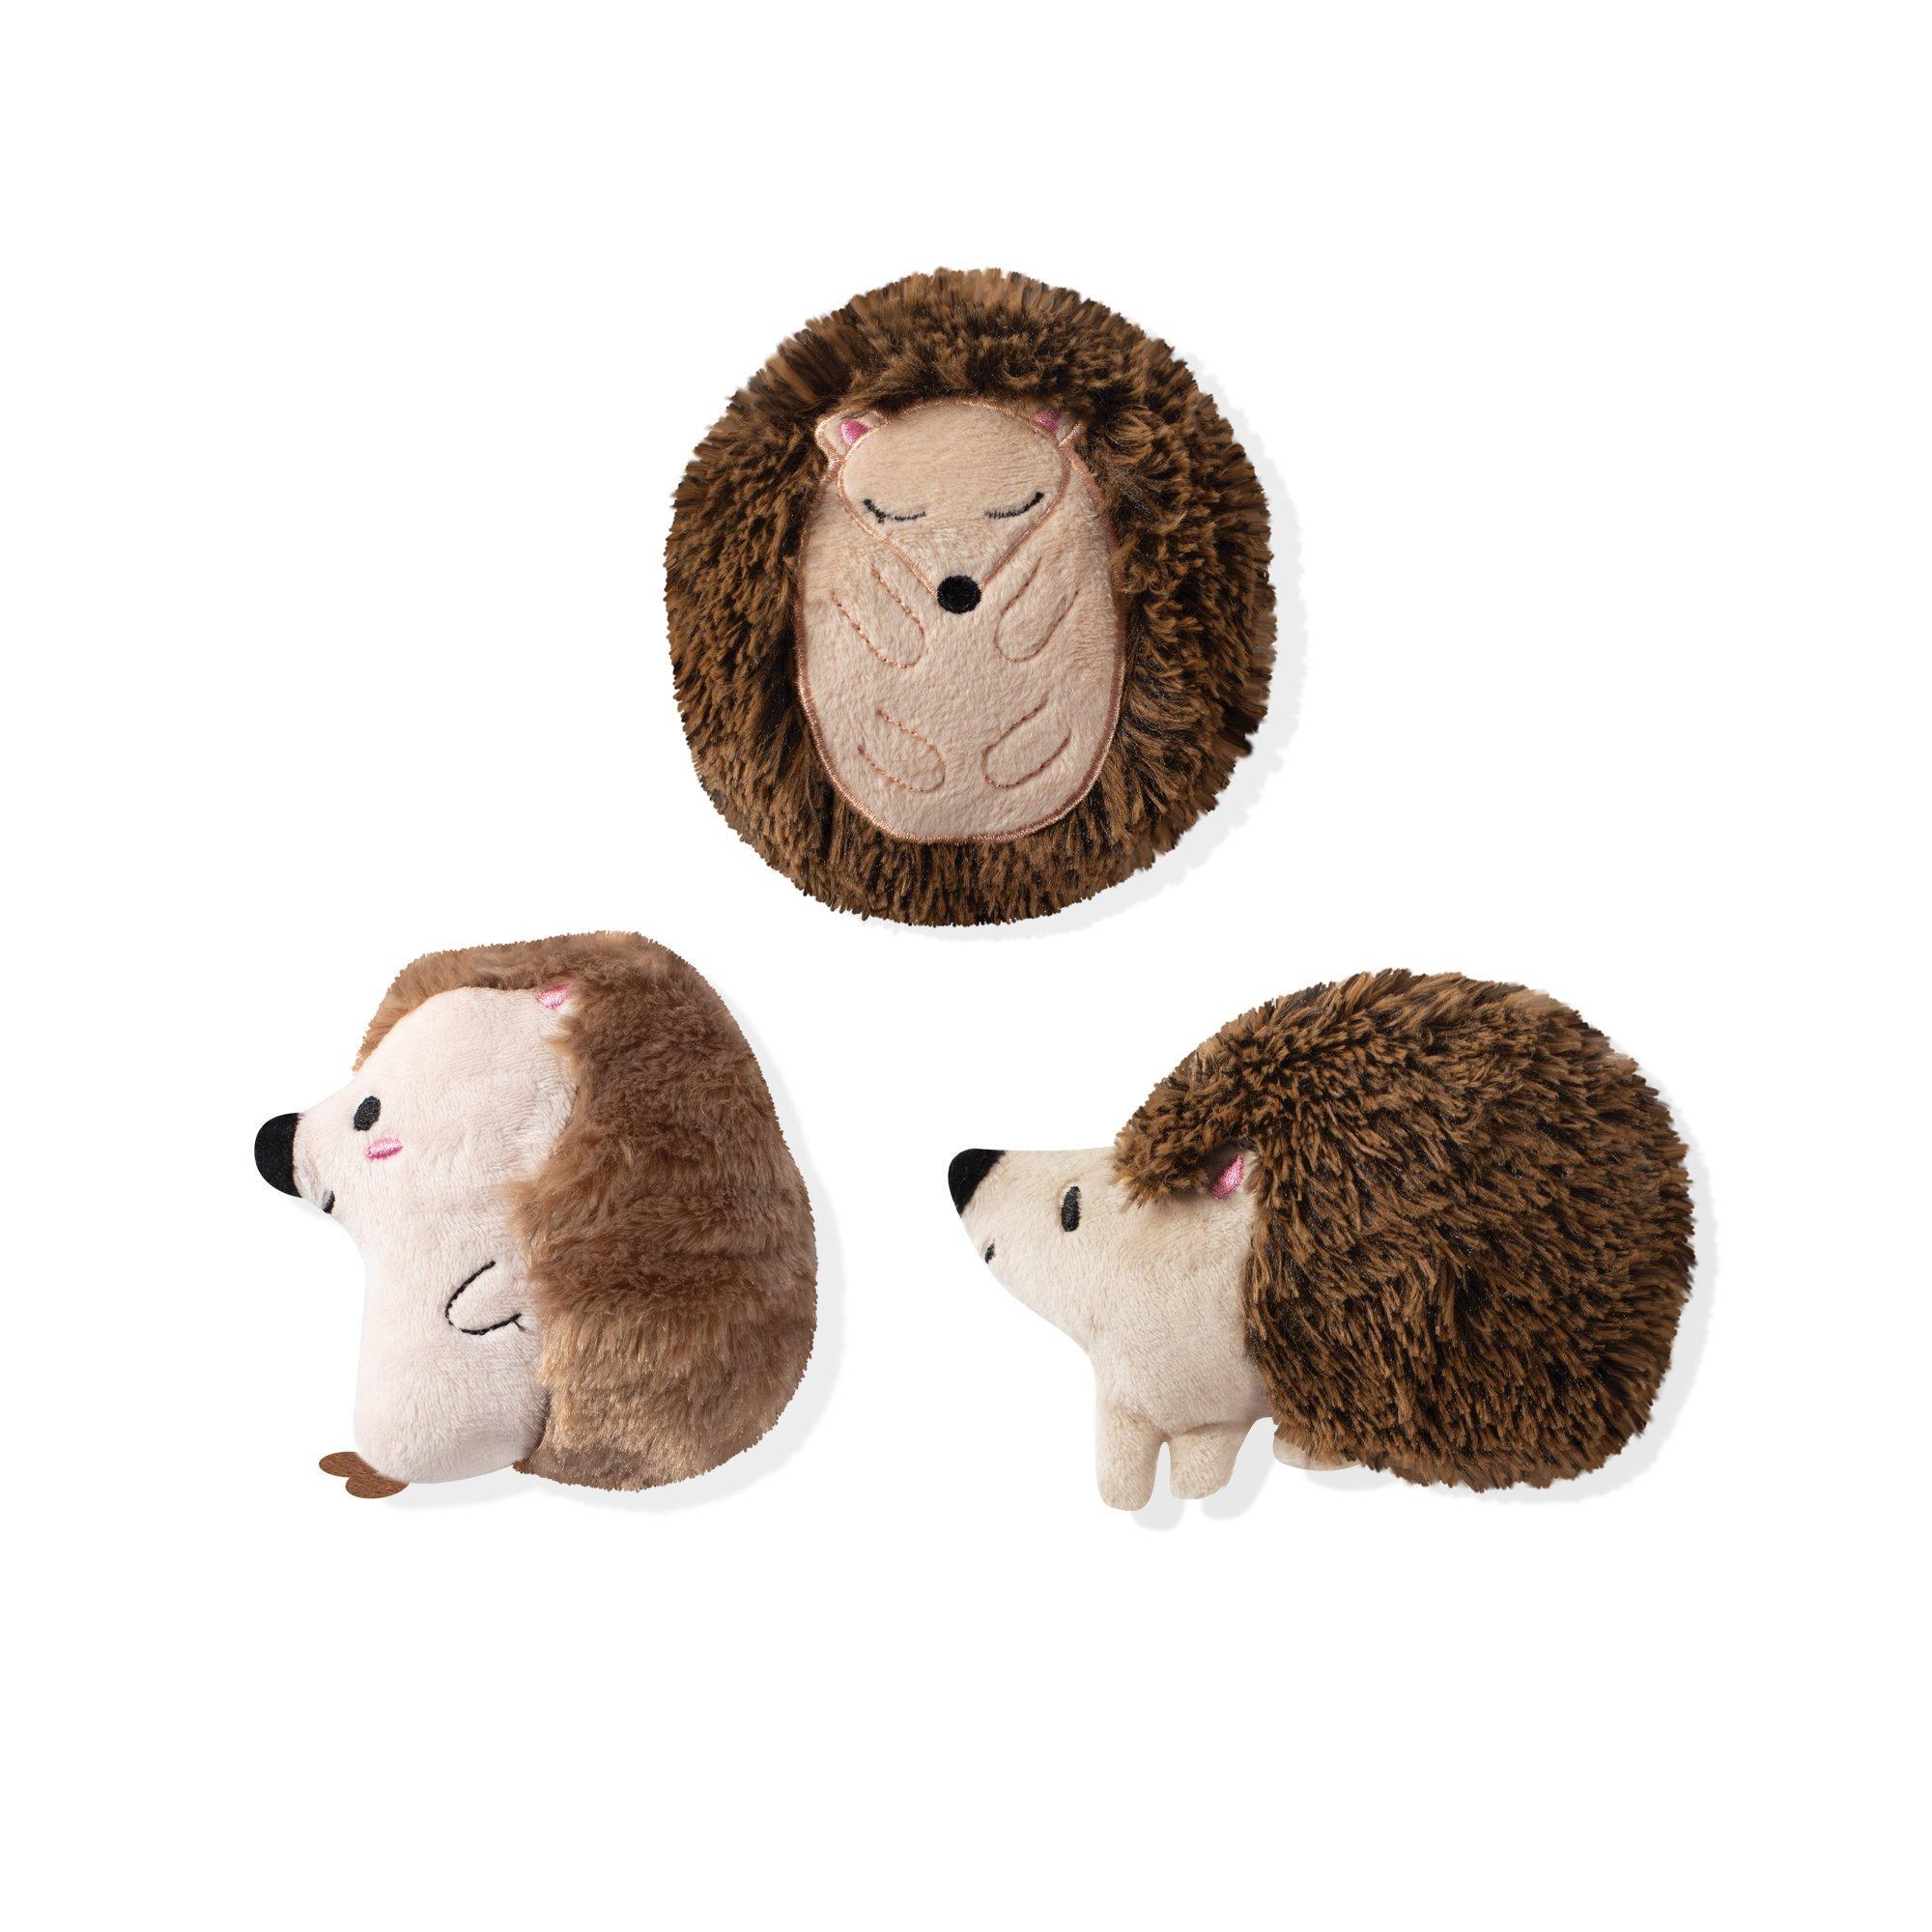 Pet Shop by Fringe Studio Hedgehogs All Day Plush Squeaker Dog Toys, set of 3